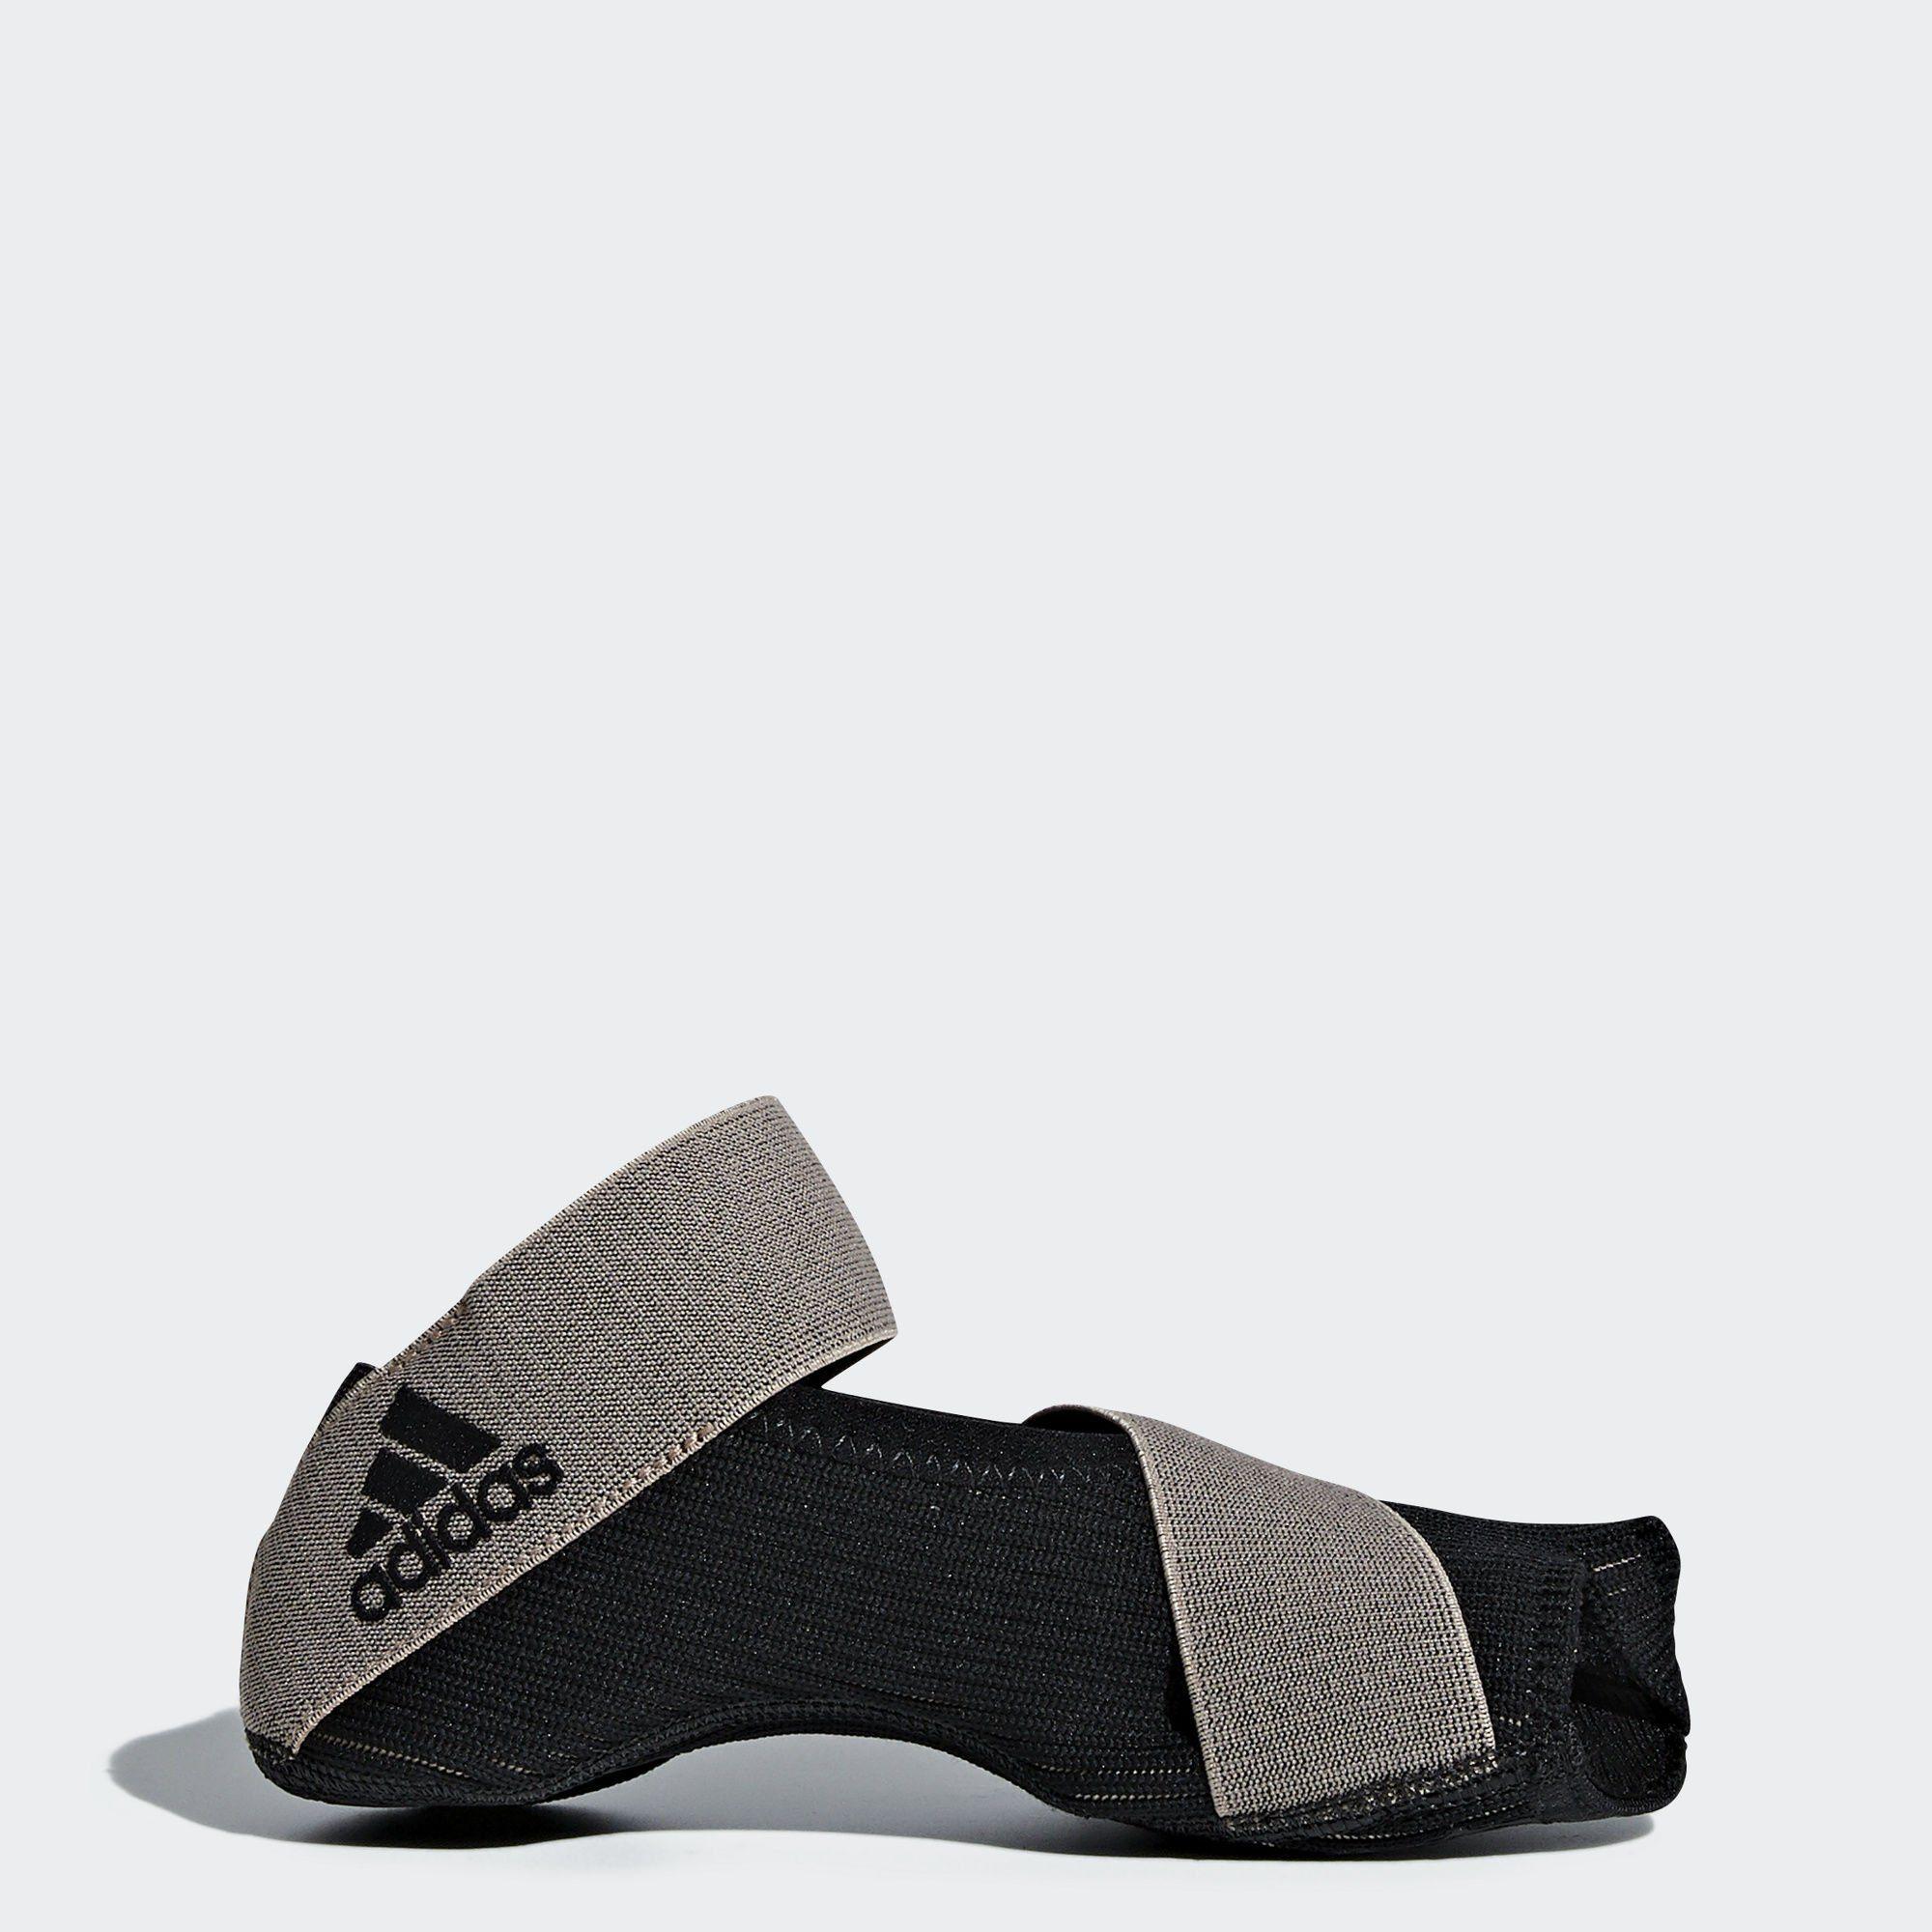 adidas Performance CrazyMove Studio Prime Schuh Trainingsschuh online kaufen  black